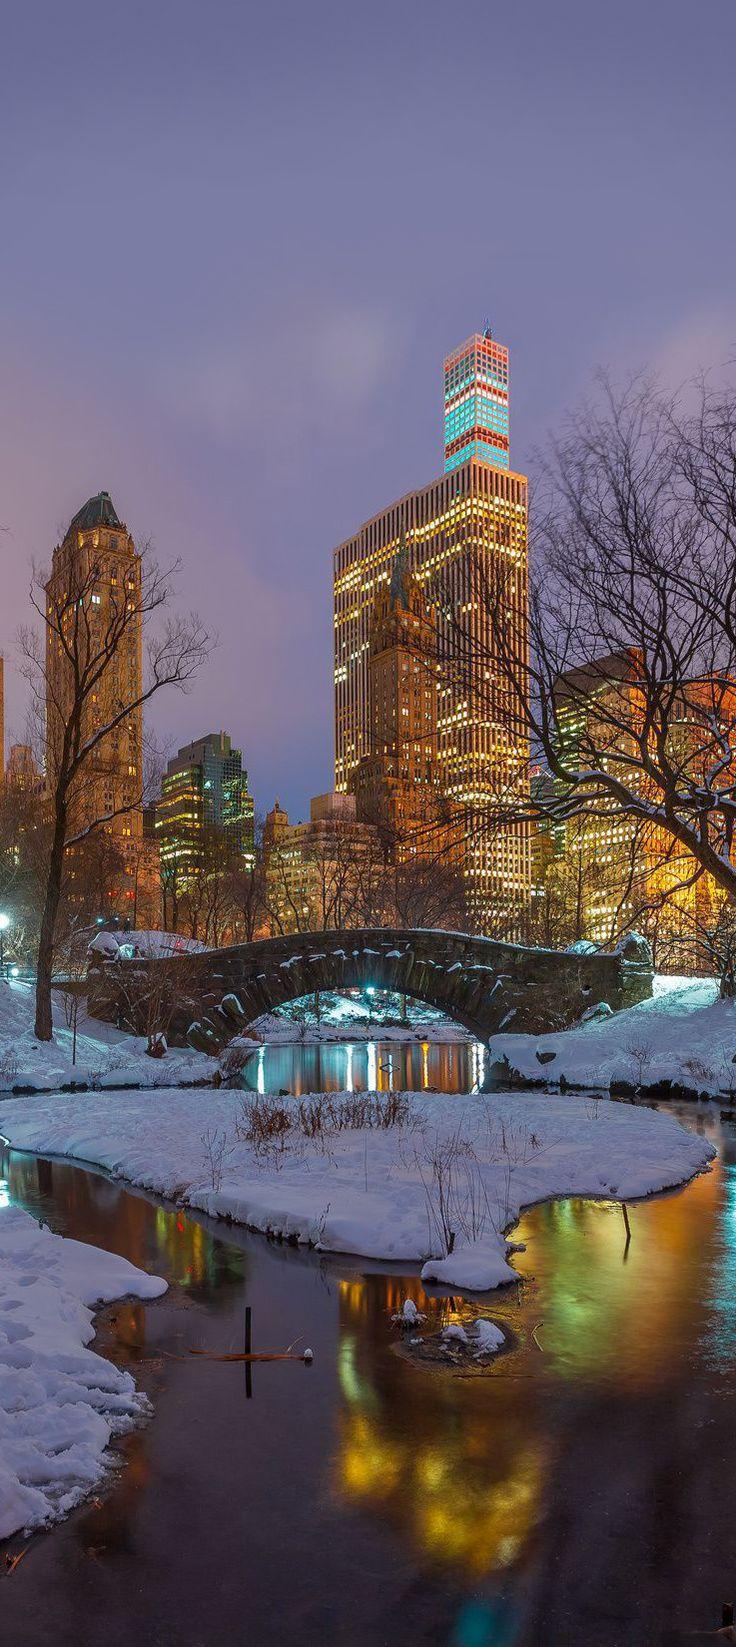 Romantic Central Park, New York City